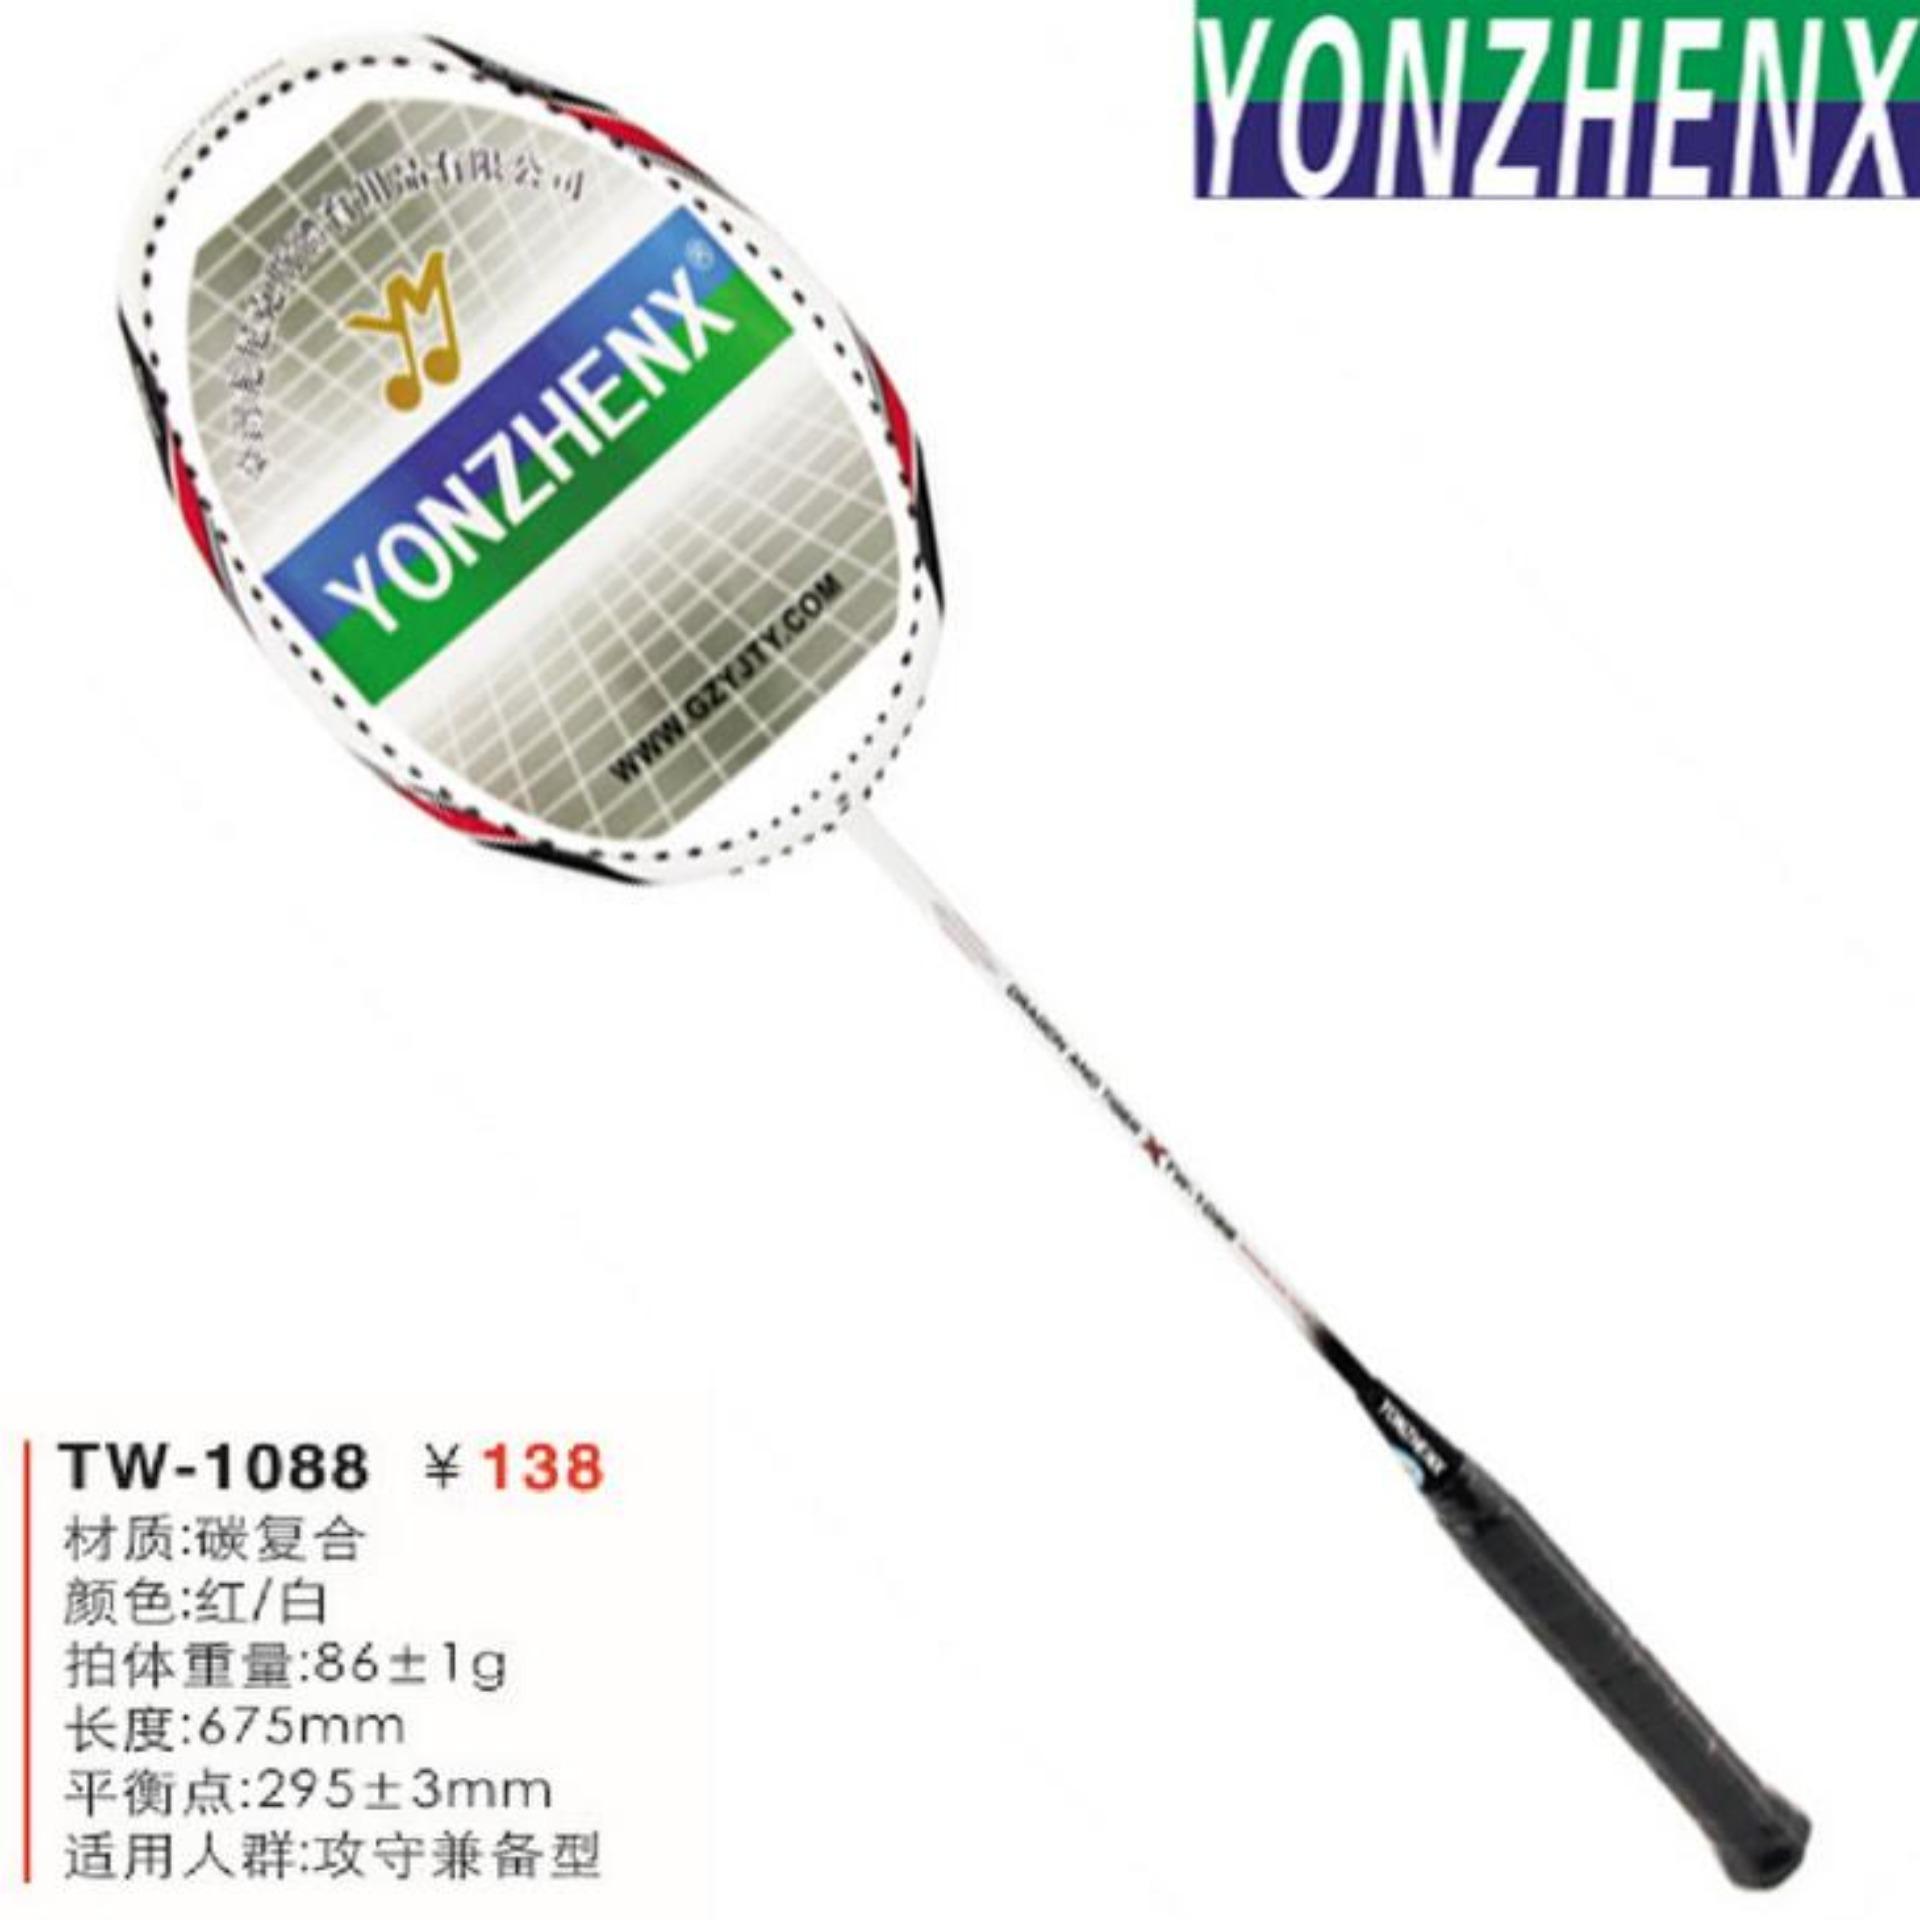 BADMINTON RACKET 86G INTL. YONZHENX Manufacturers Selling Lightweight Carbon Fiber BadmintonRacket (